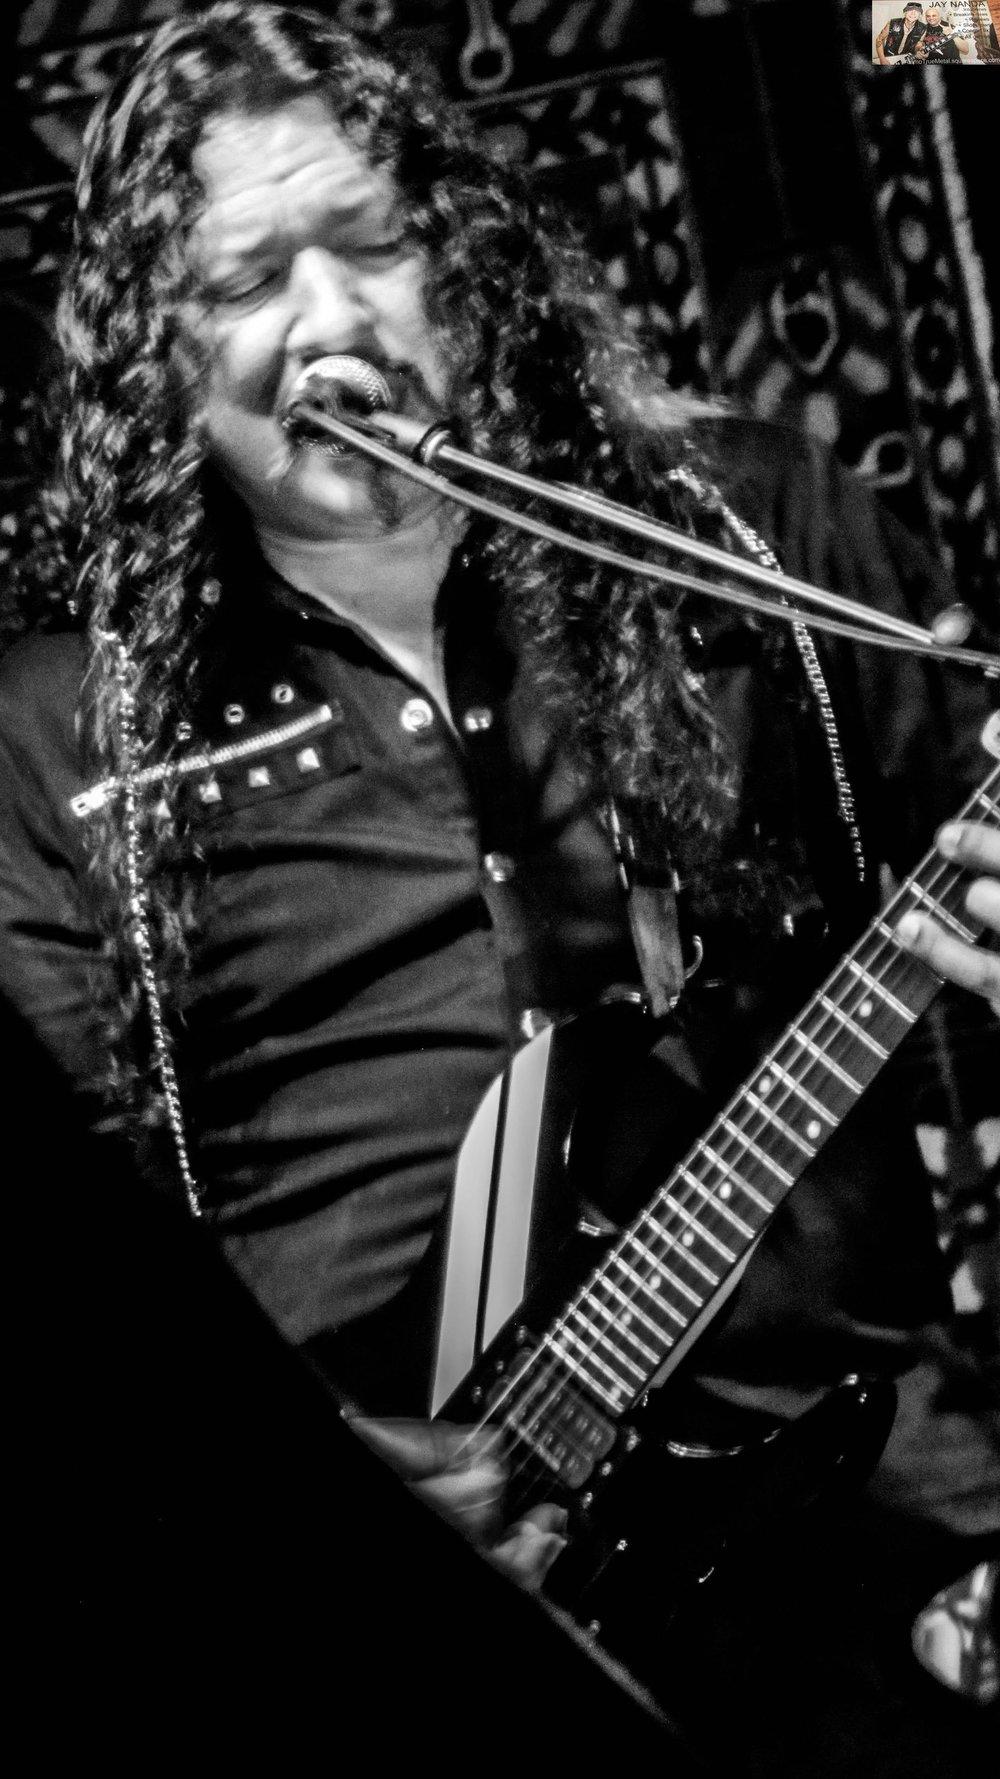 Original lead guitarist Oz Fox provides some backup vocals.